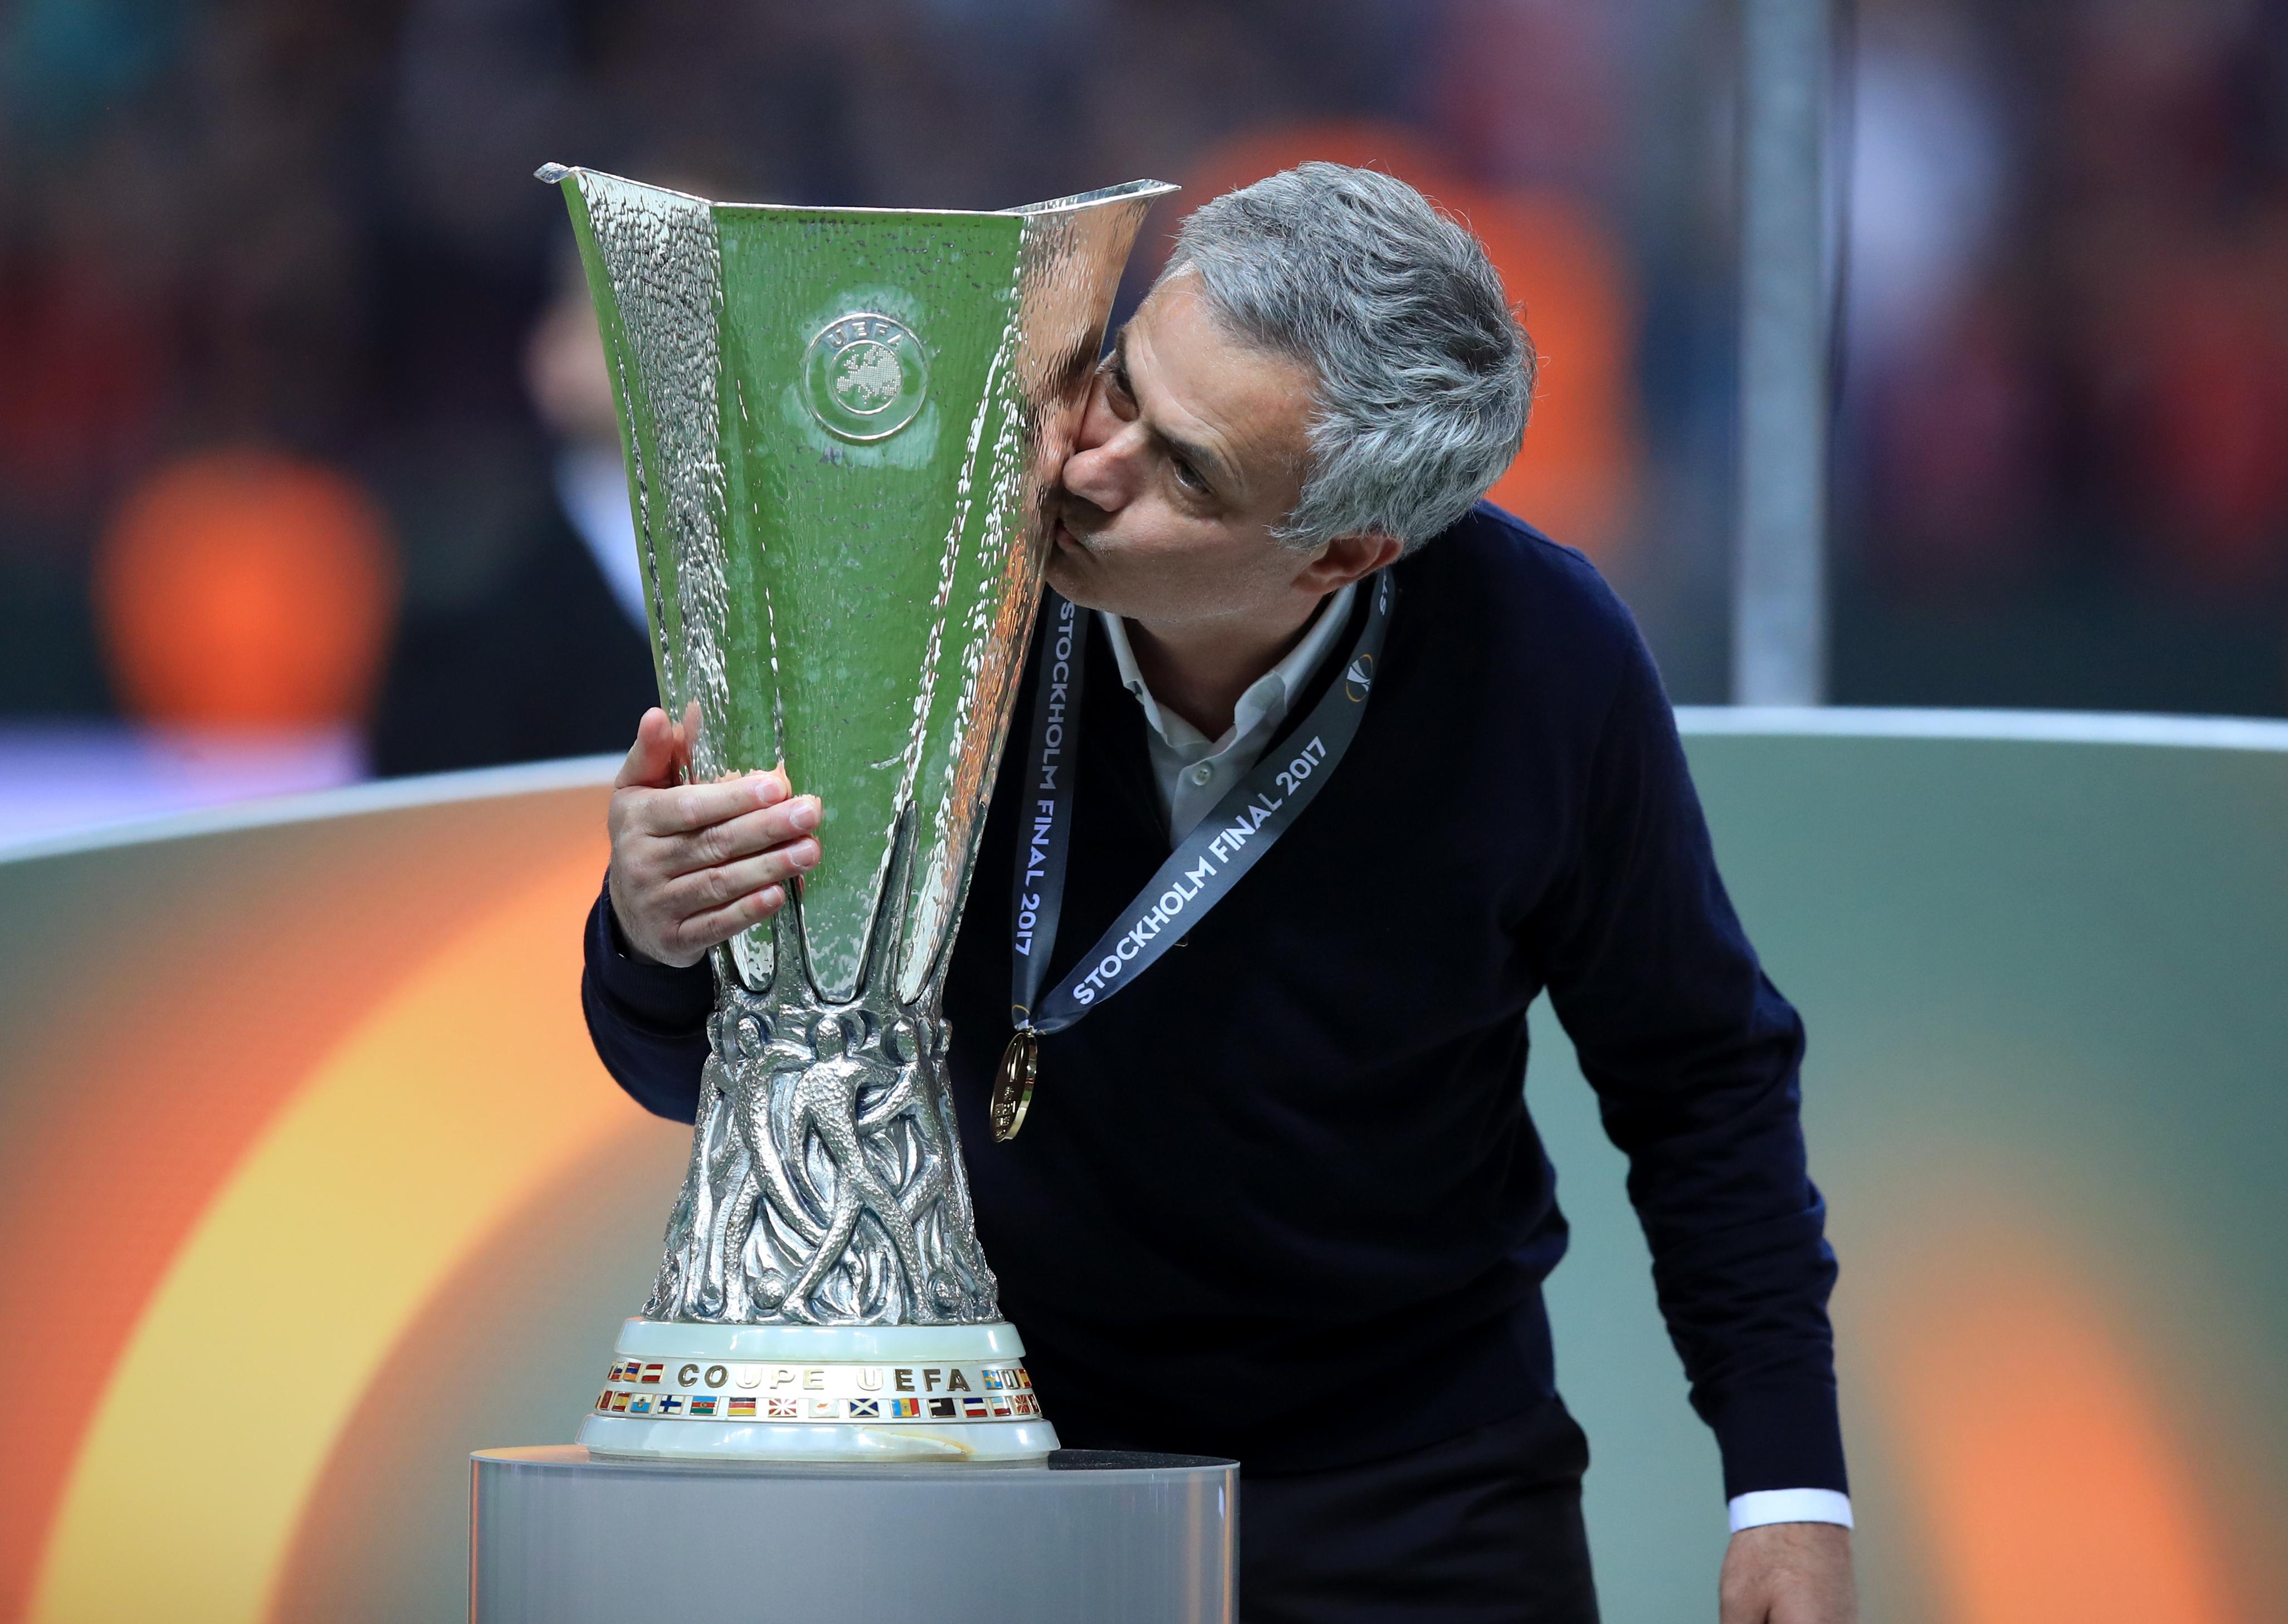 Jose Mourinho led Manchester United to Europa League glory lats season